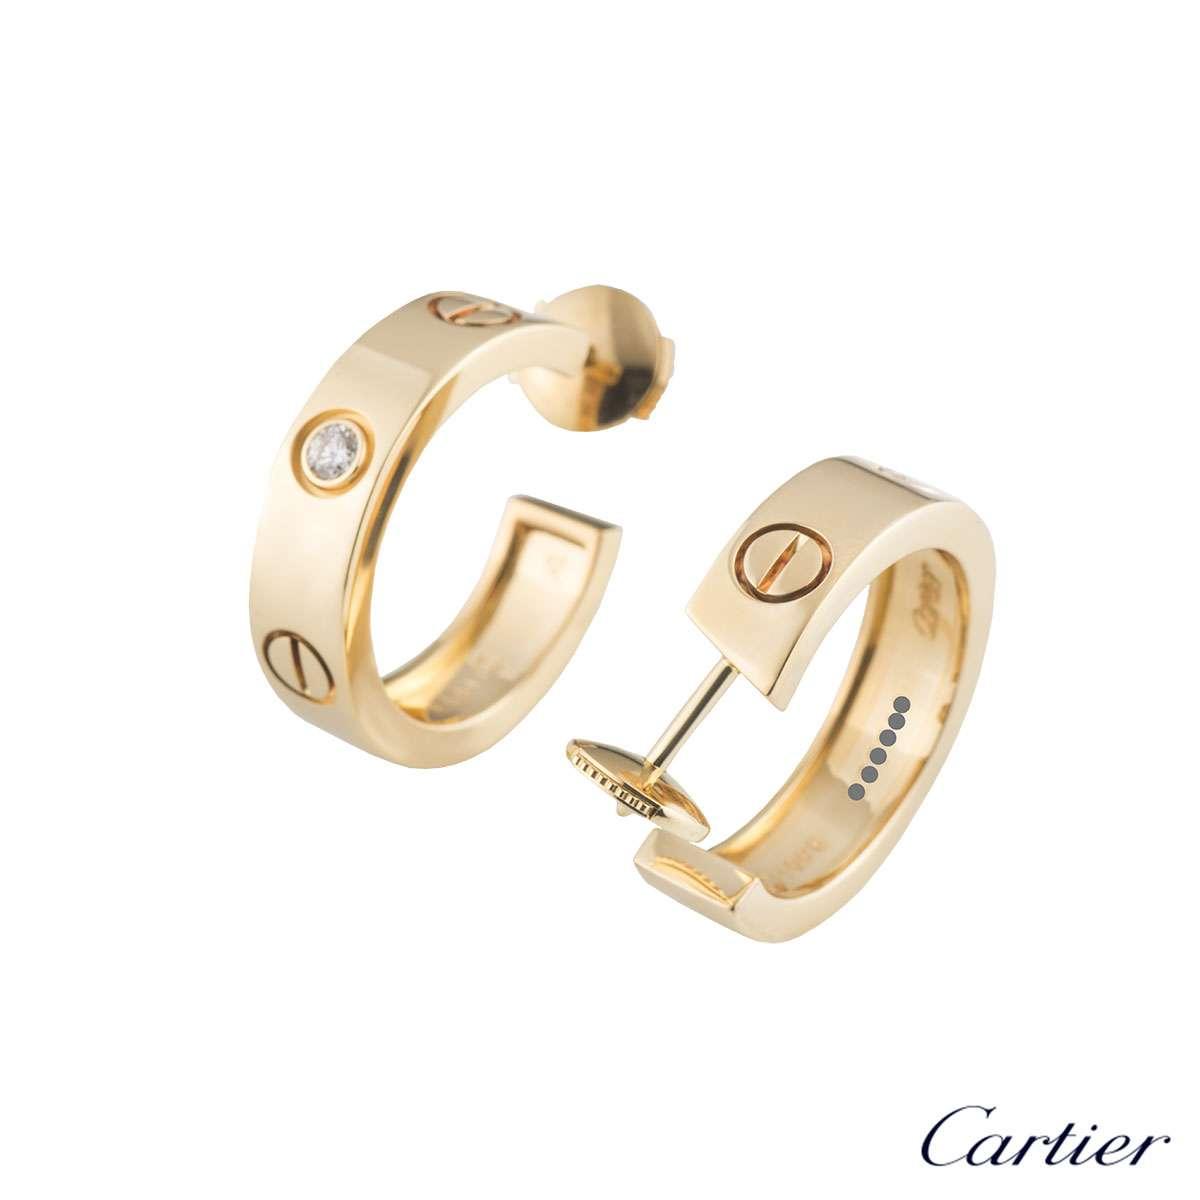 Cartier Yellow Gold Diamond Love Earrings B8022900